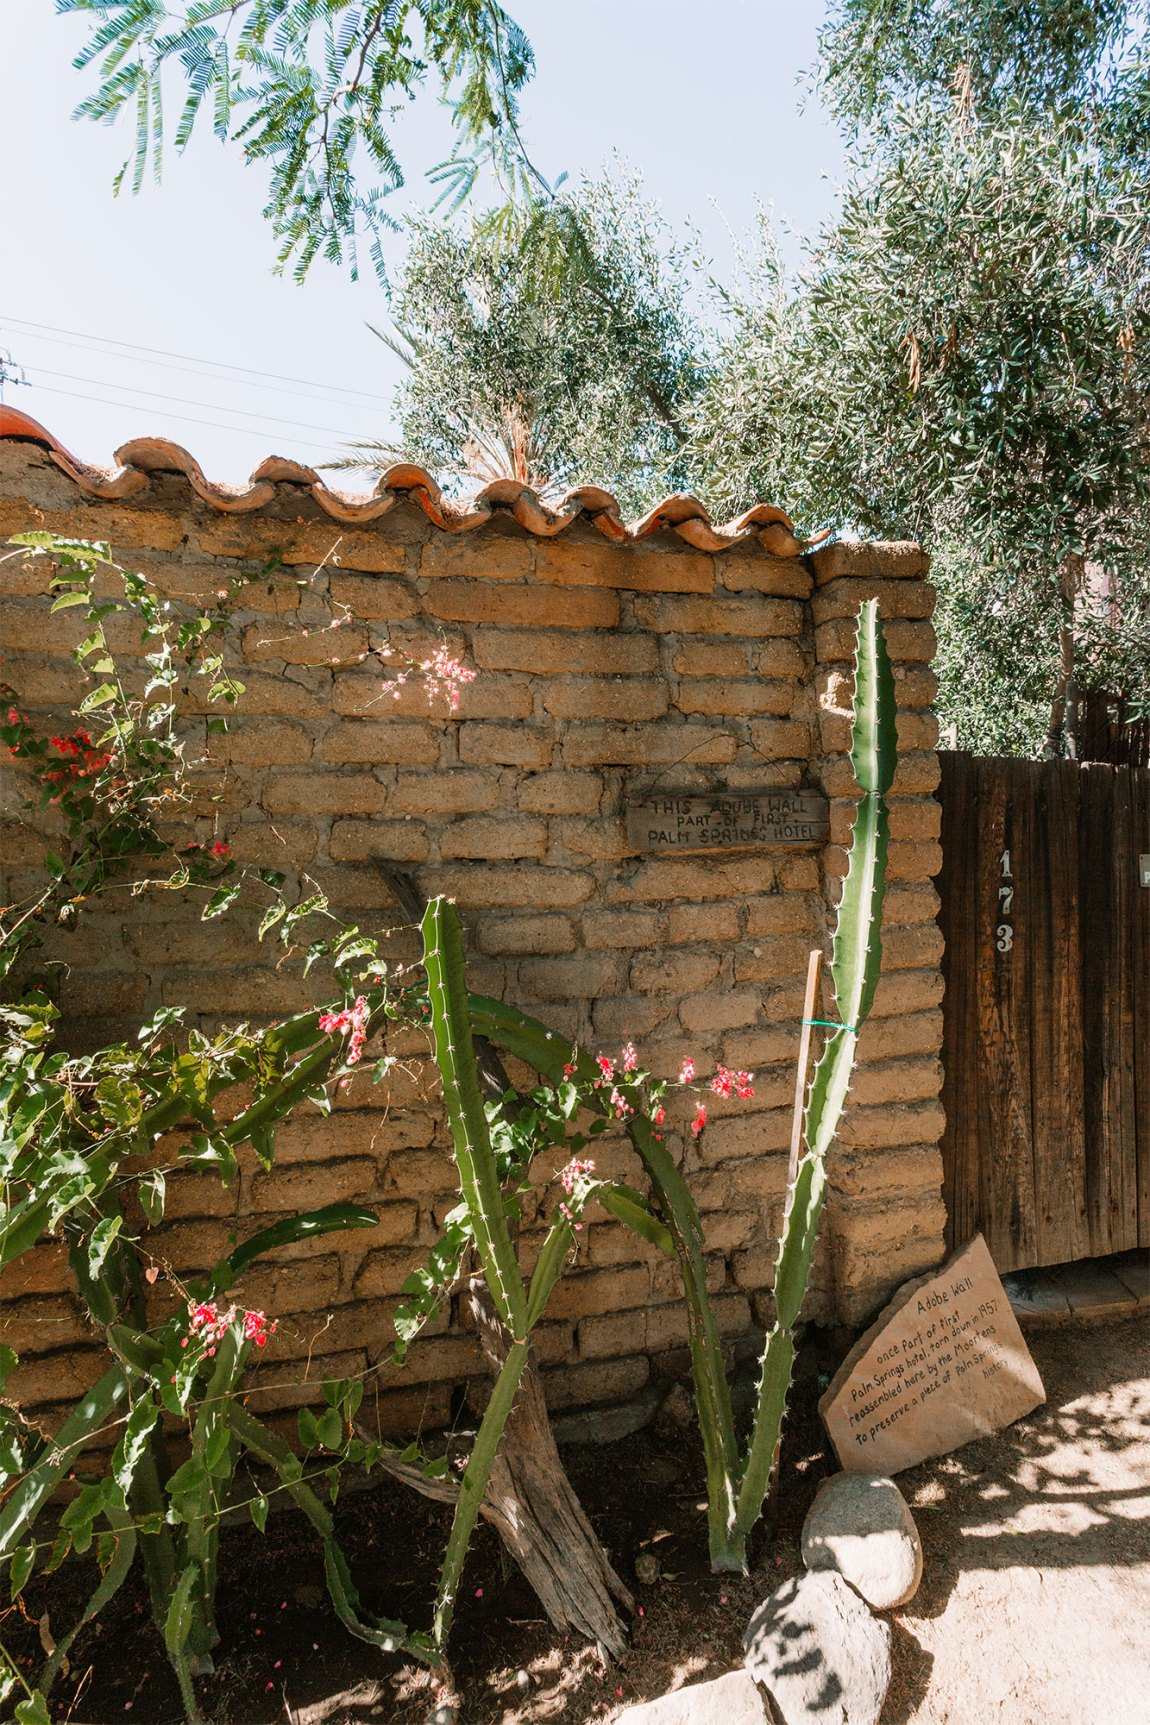 Tall cactus against brick wall